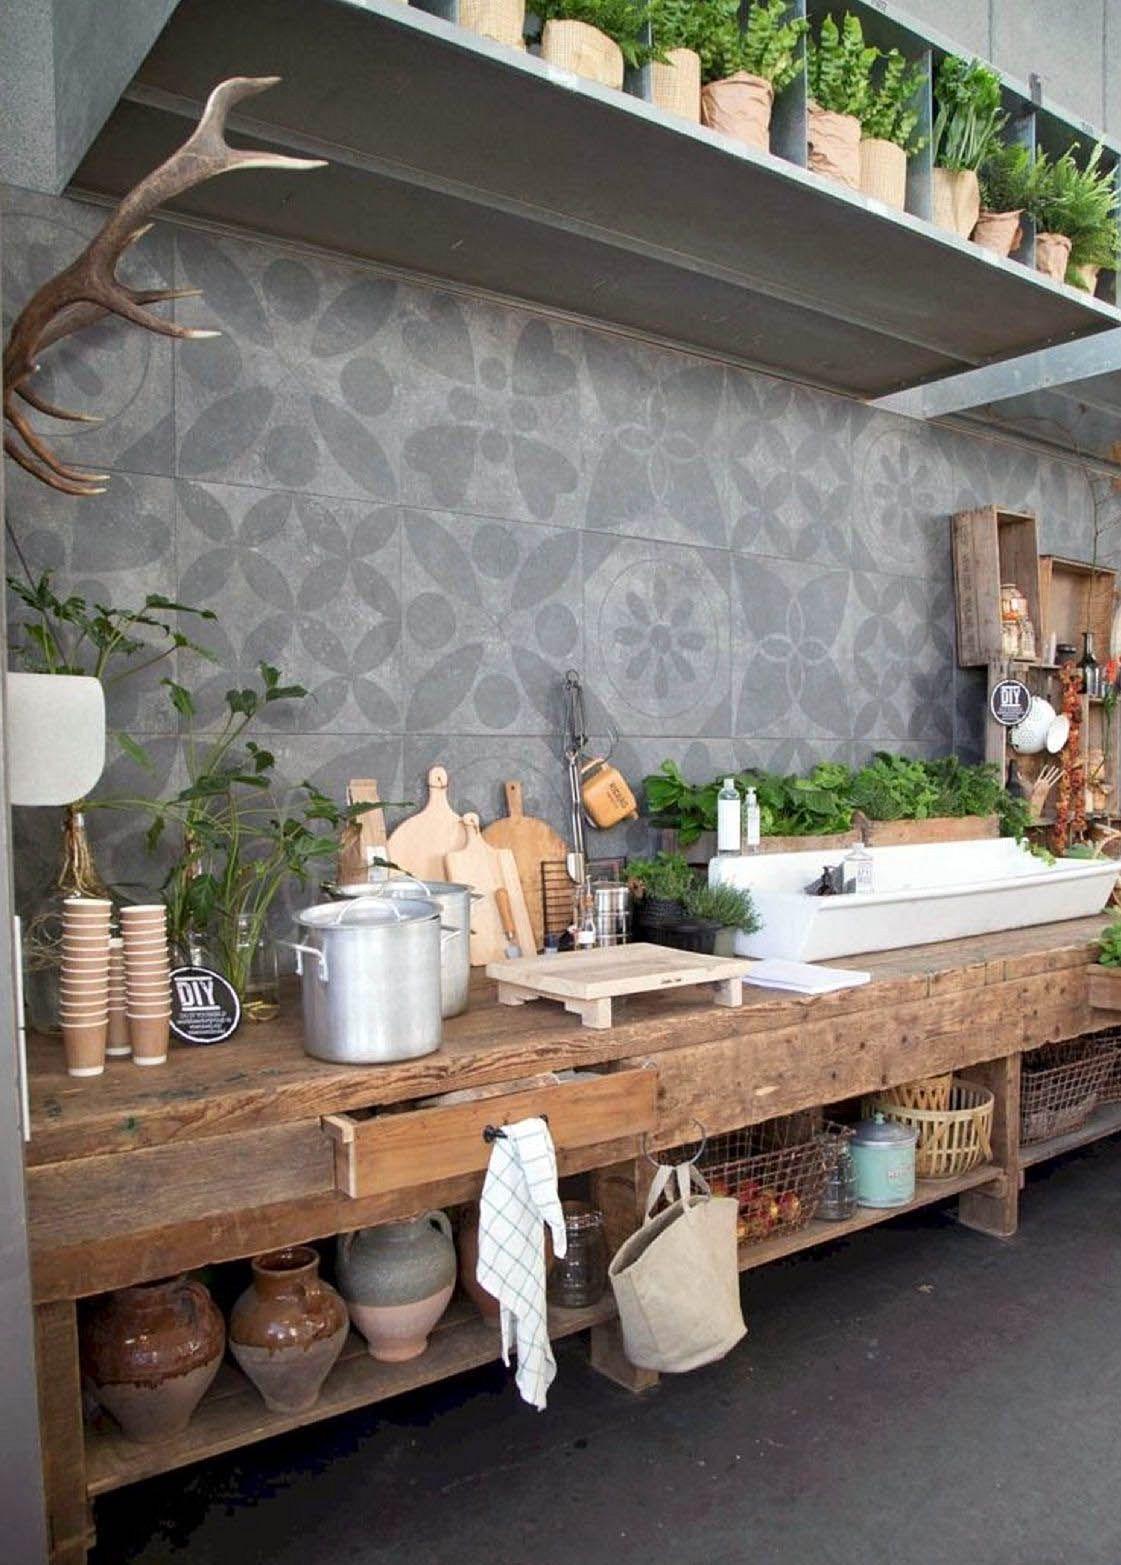 12 Inspiring Outdoor Kitchen Ideas For Enjoying Your Winter Season Outdoor Kitchen Outdoor Kitchen Countertops Outdoor Kitchen Design